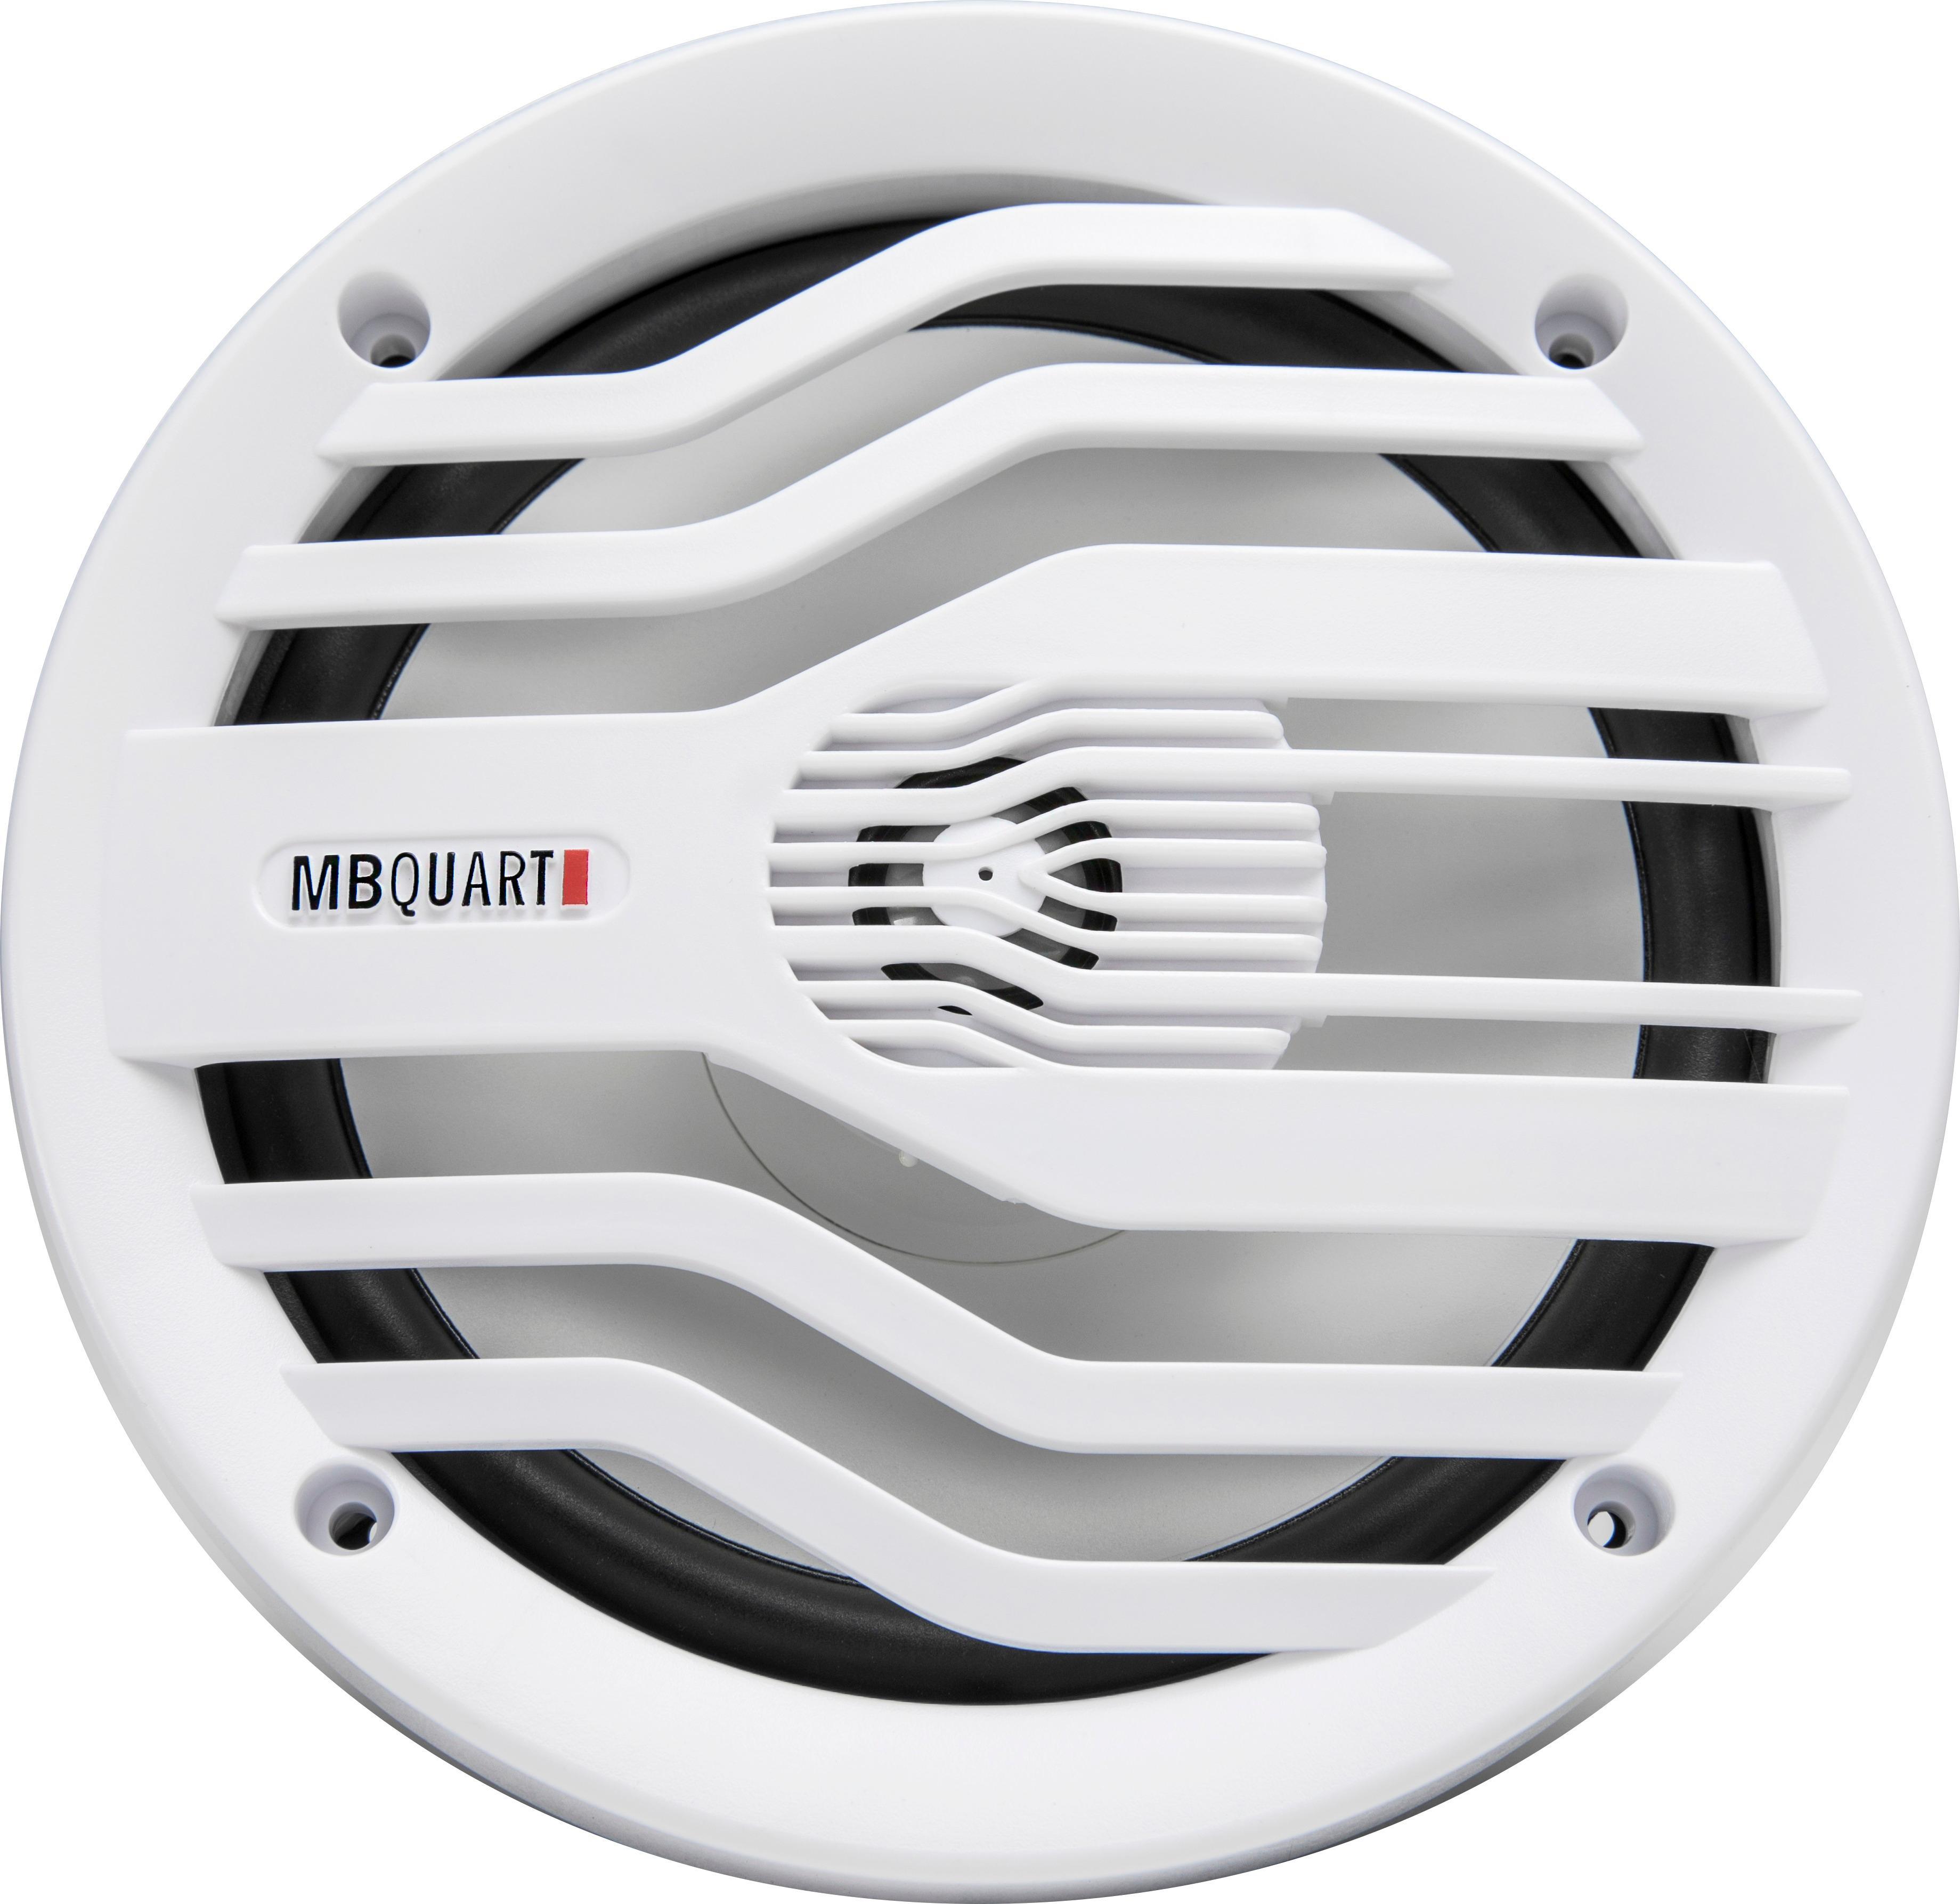 "MB Quart - NAUTIC 6-1/2"" 2-Way Marine Speakers with Composite Polypropylene Cones (Pair) - White"